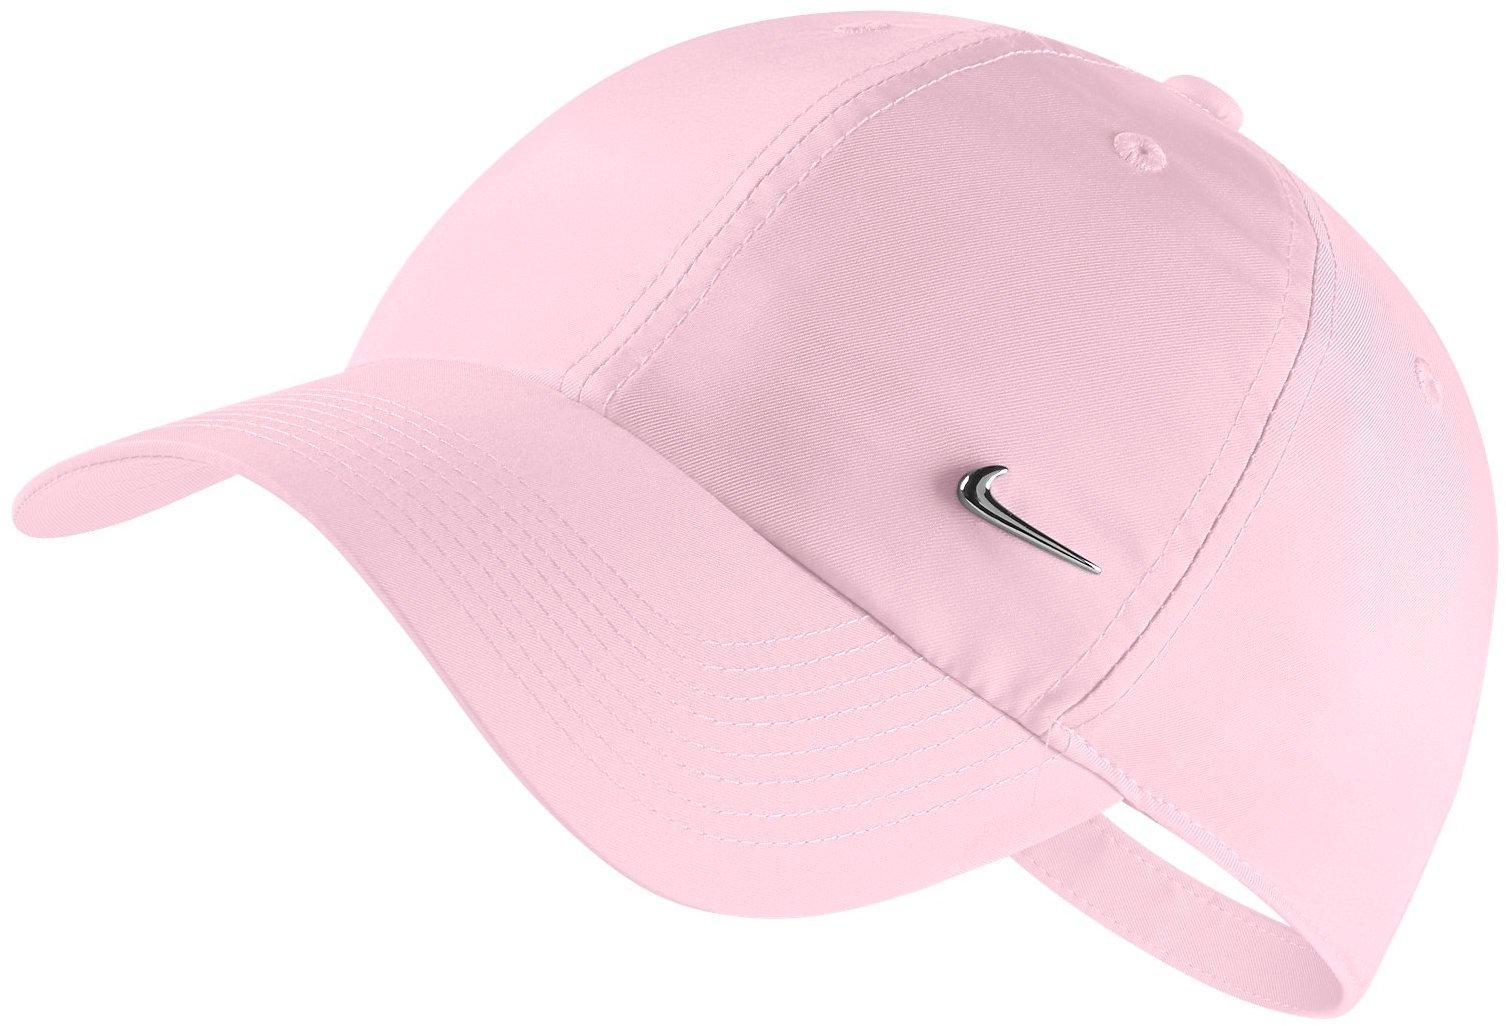 proteger Red Haz lo mejor que pueda  Cap Nike U NK H86 CAP METAL SWOOSH - Top4Running.com